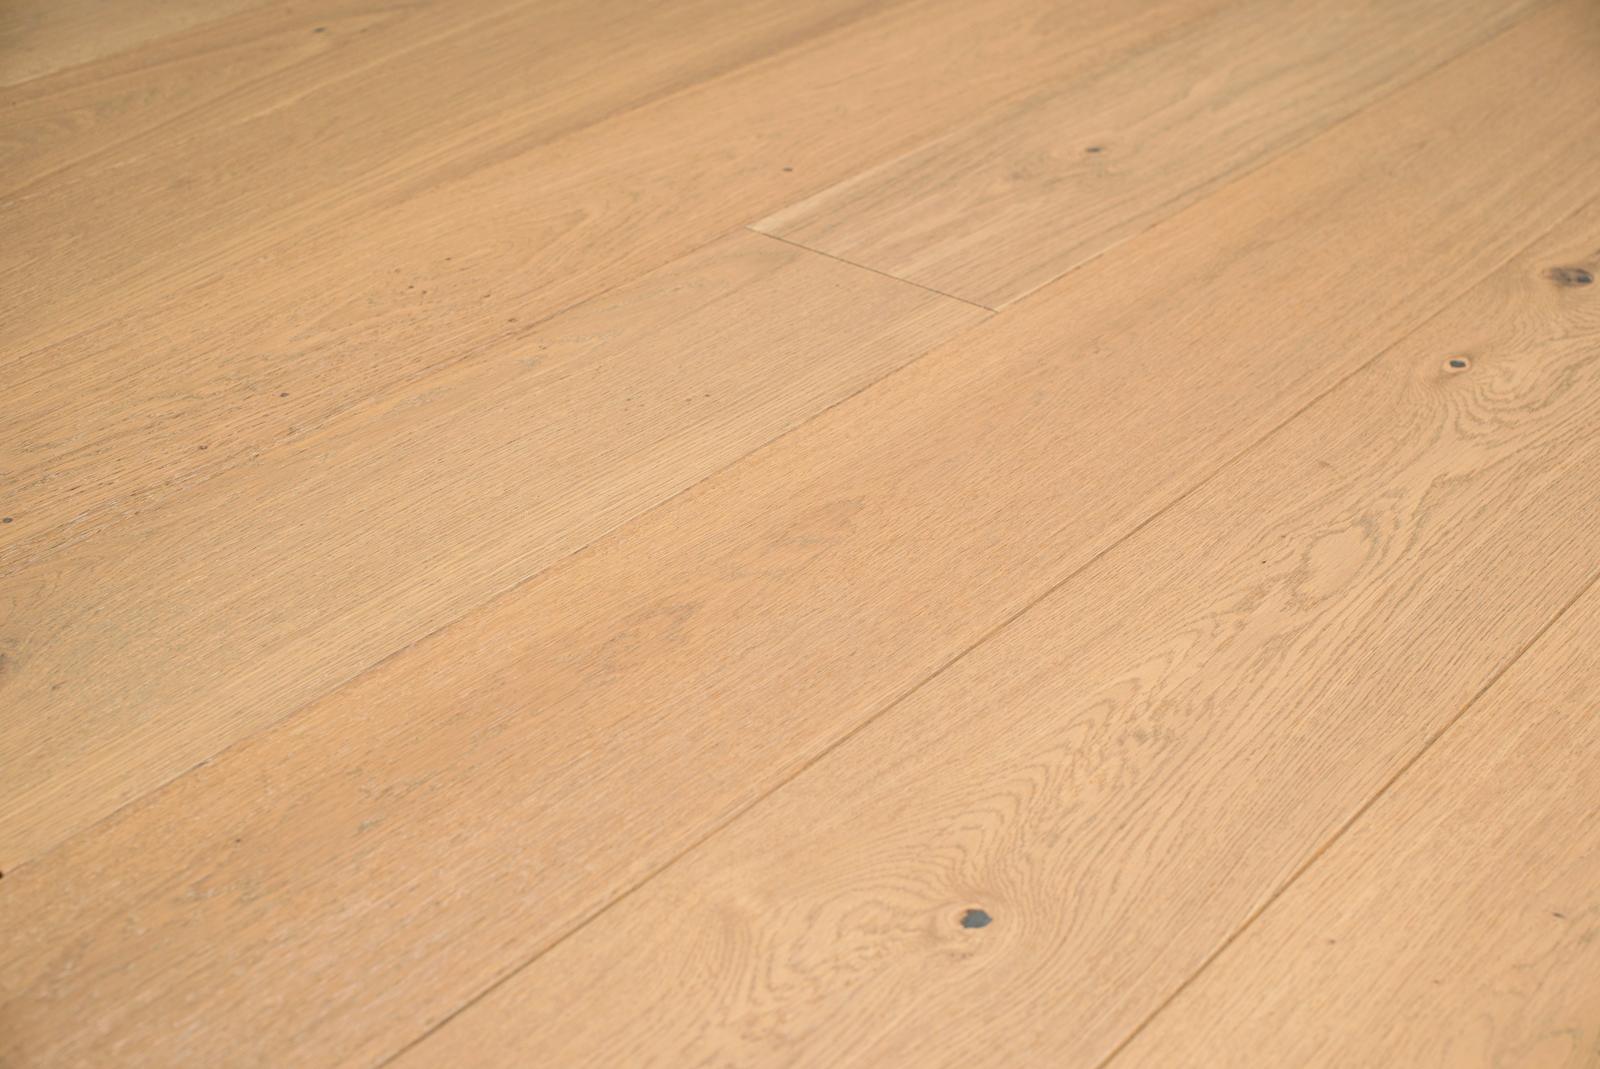 Fesca witte eiken duoplank parket vloer wit houten vloeren eik